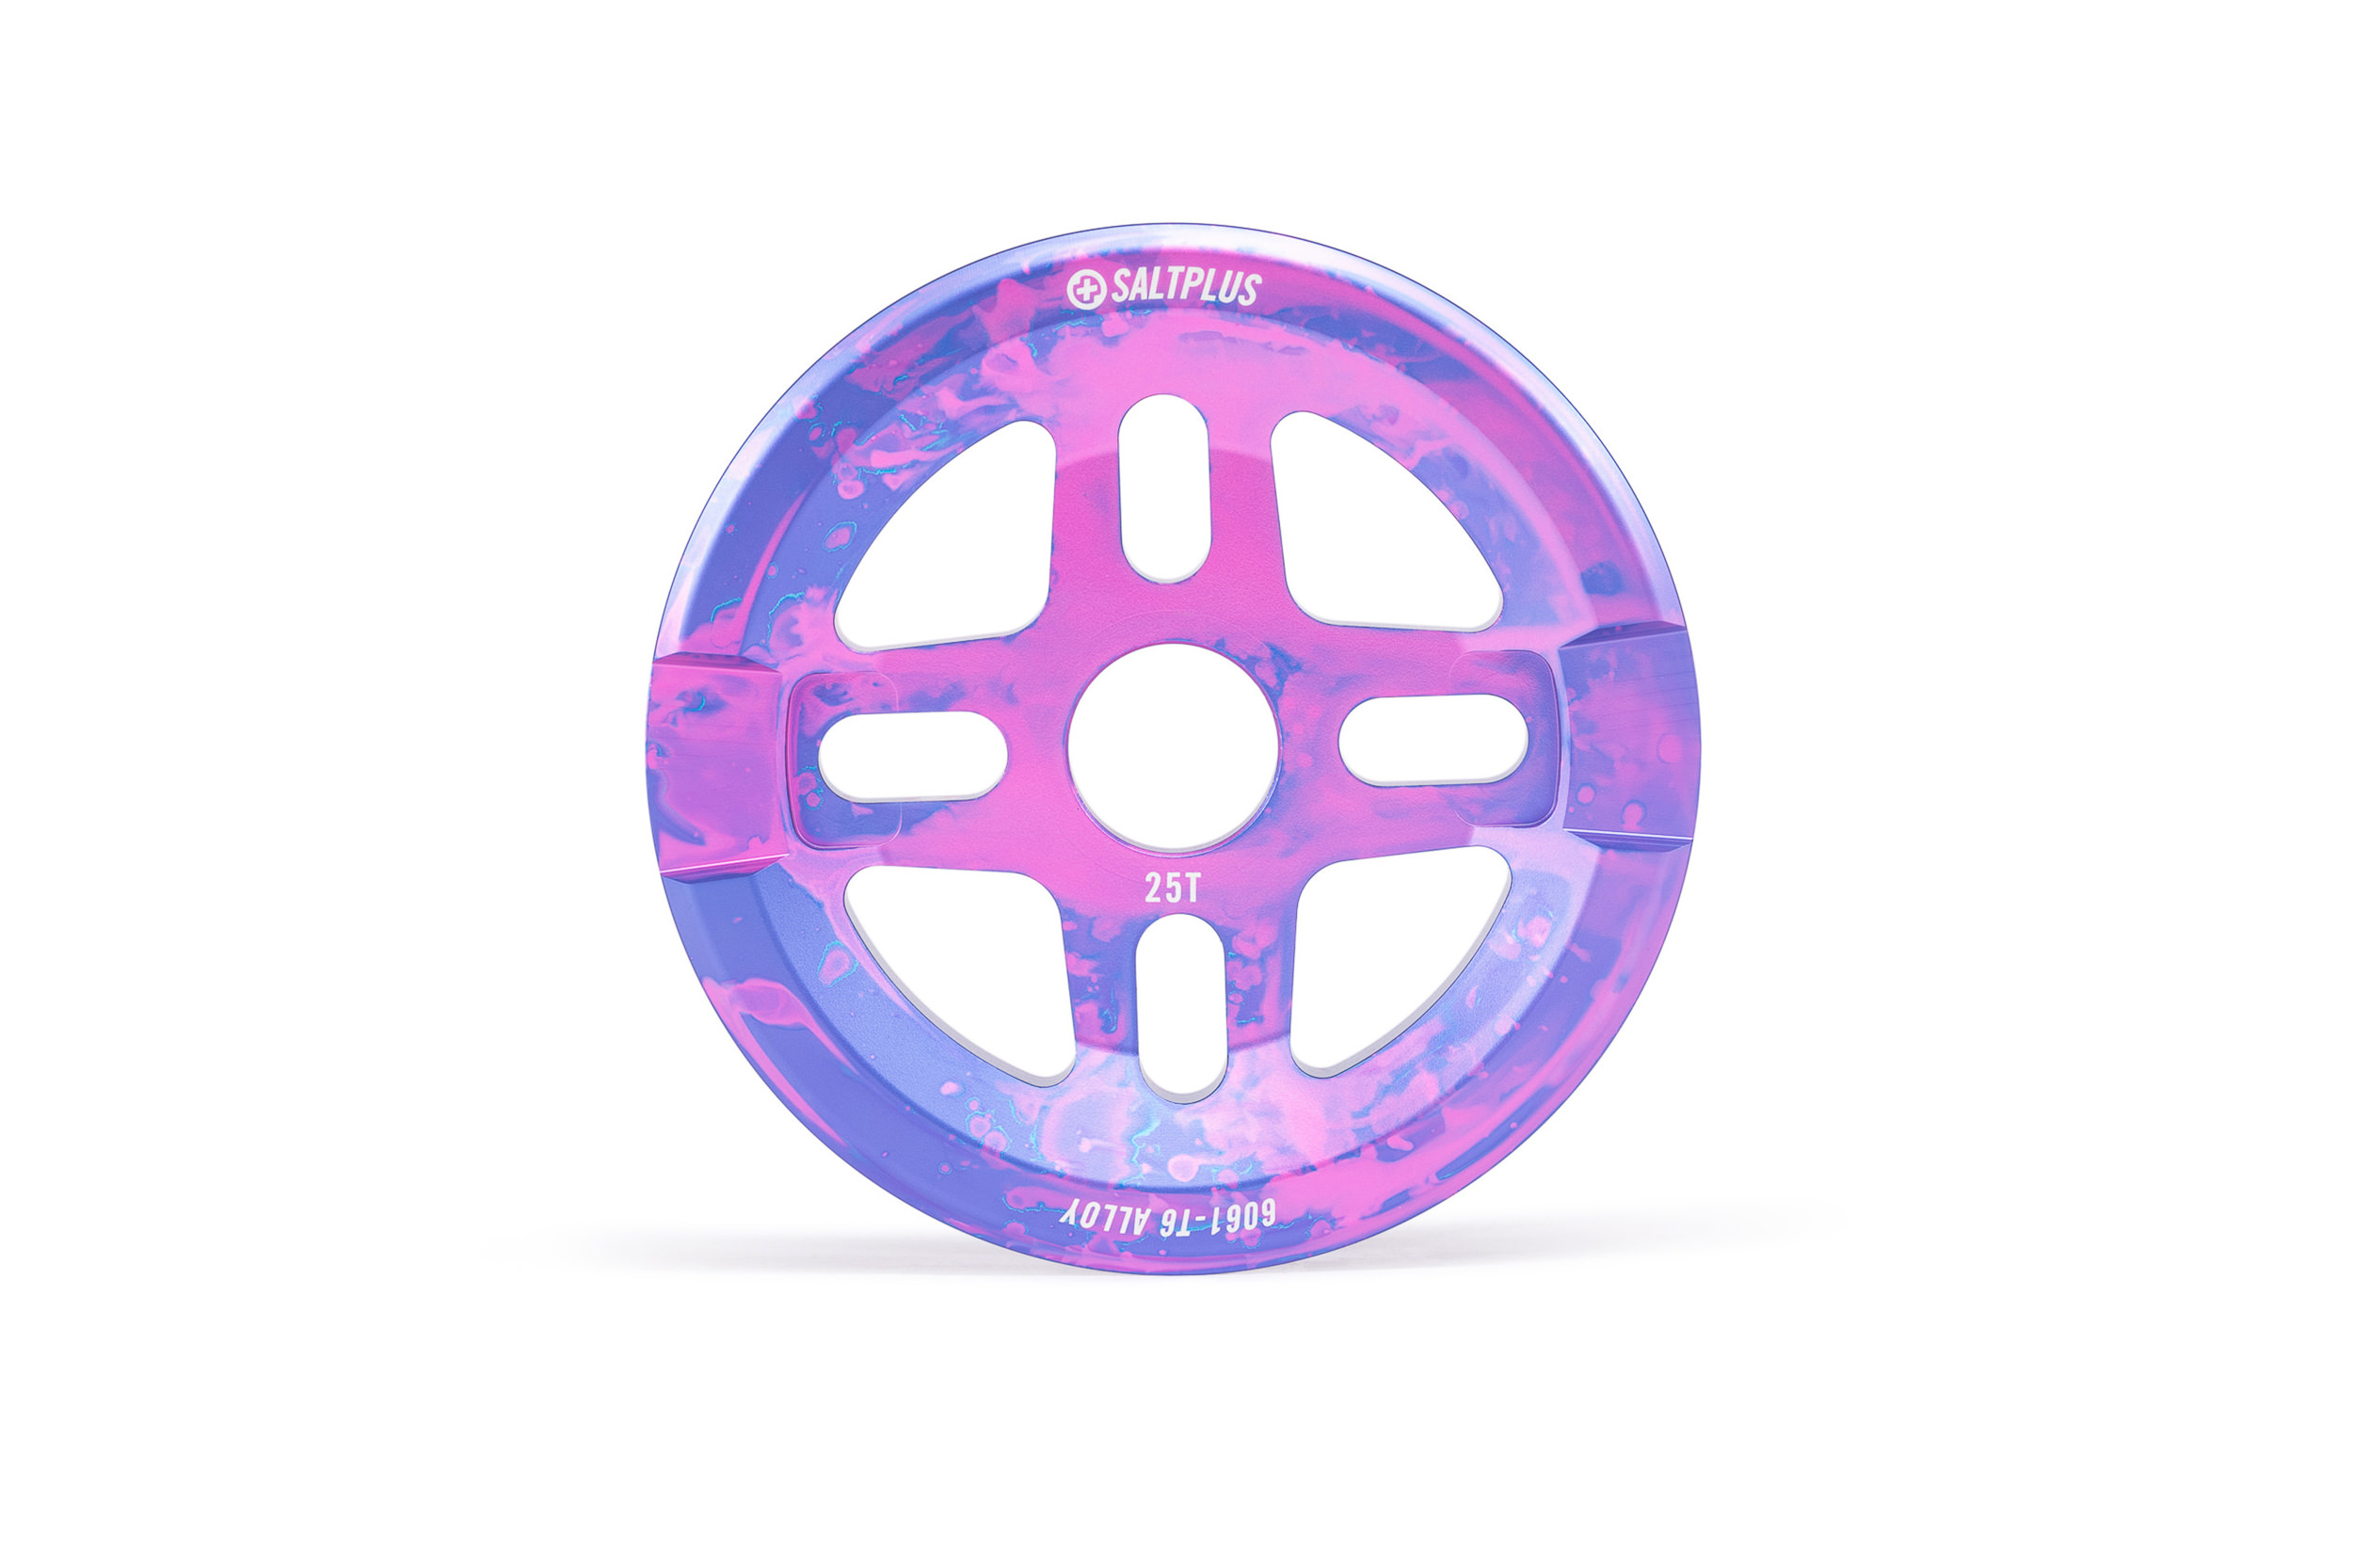 SaltPlus_Orion_sprocket_guard_25t_nebula_purple-01